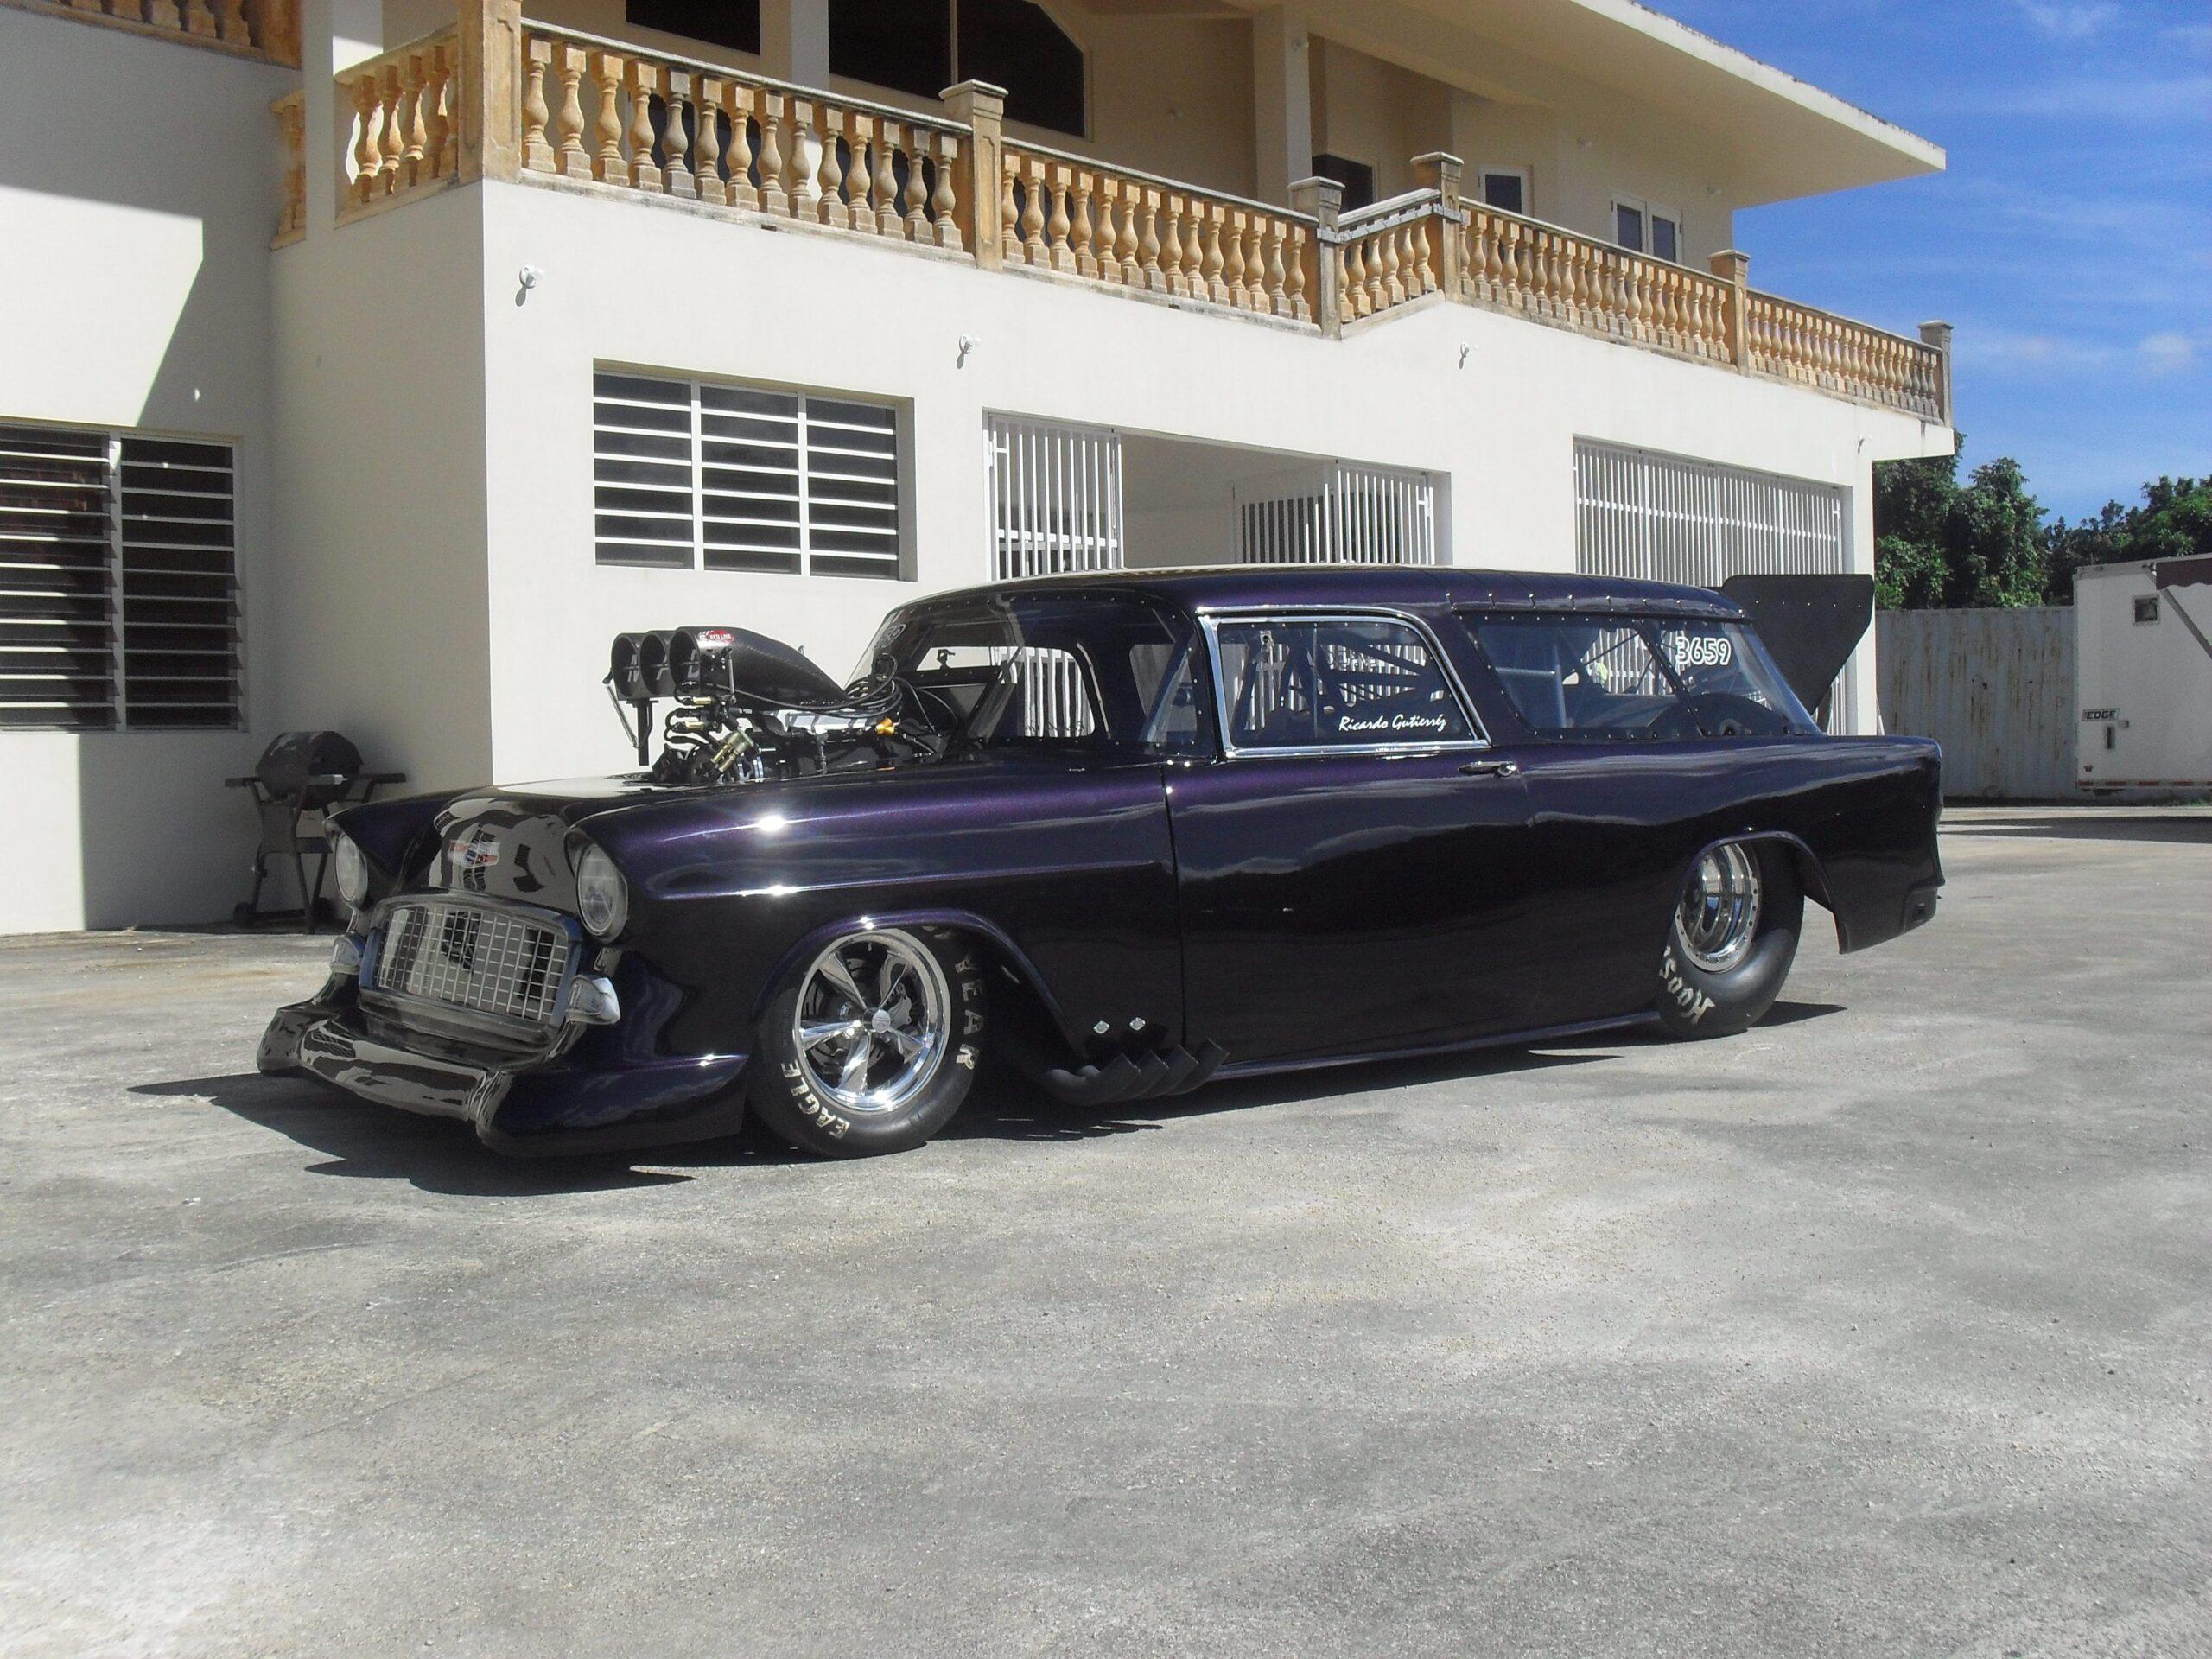 Ricardo Gutierrez - Tampa, FL - 1955 Chevrolet Nomad